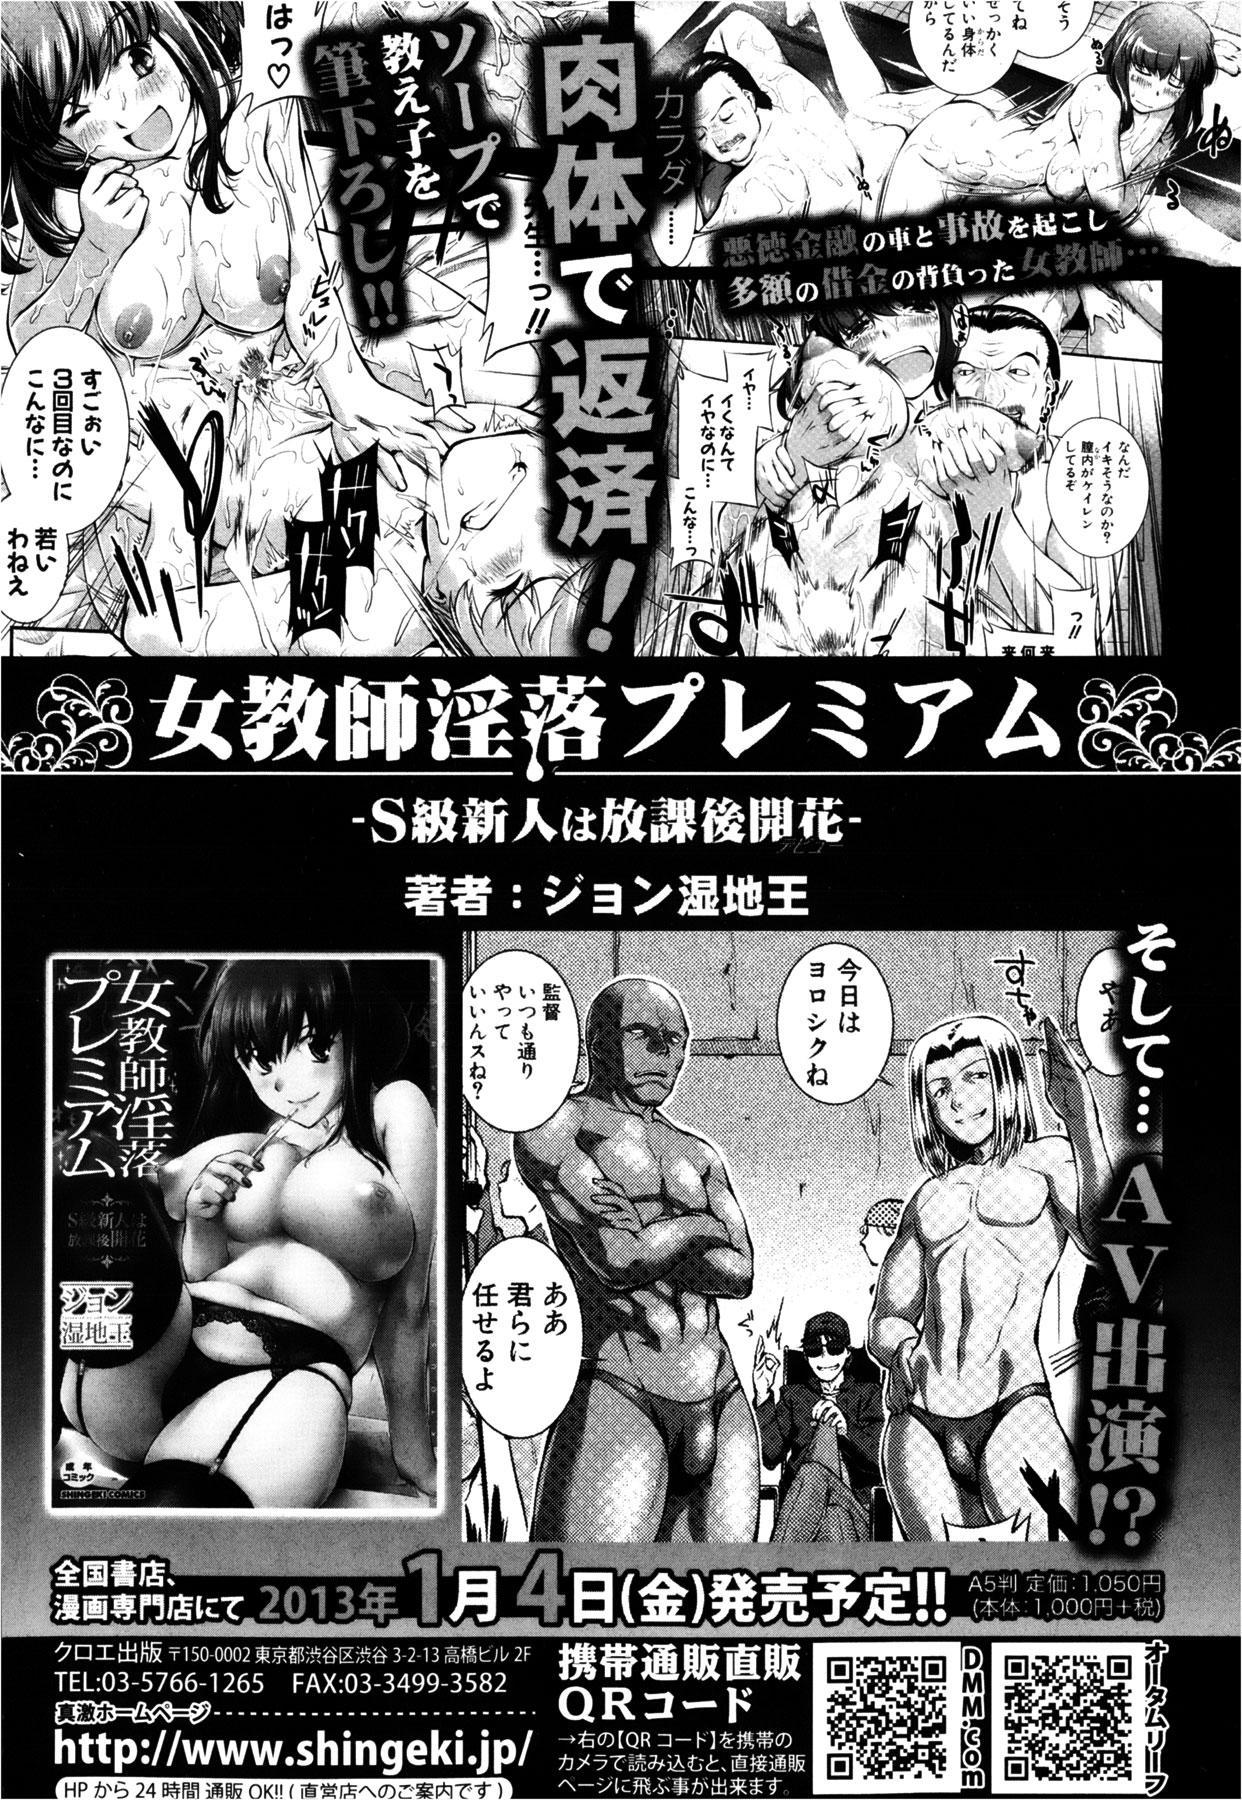 COMIC Shingeki 2013-02 7